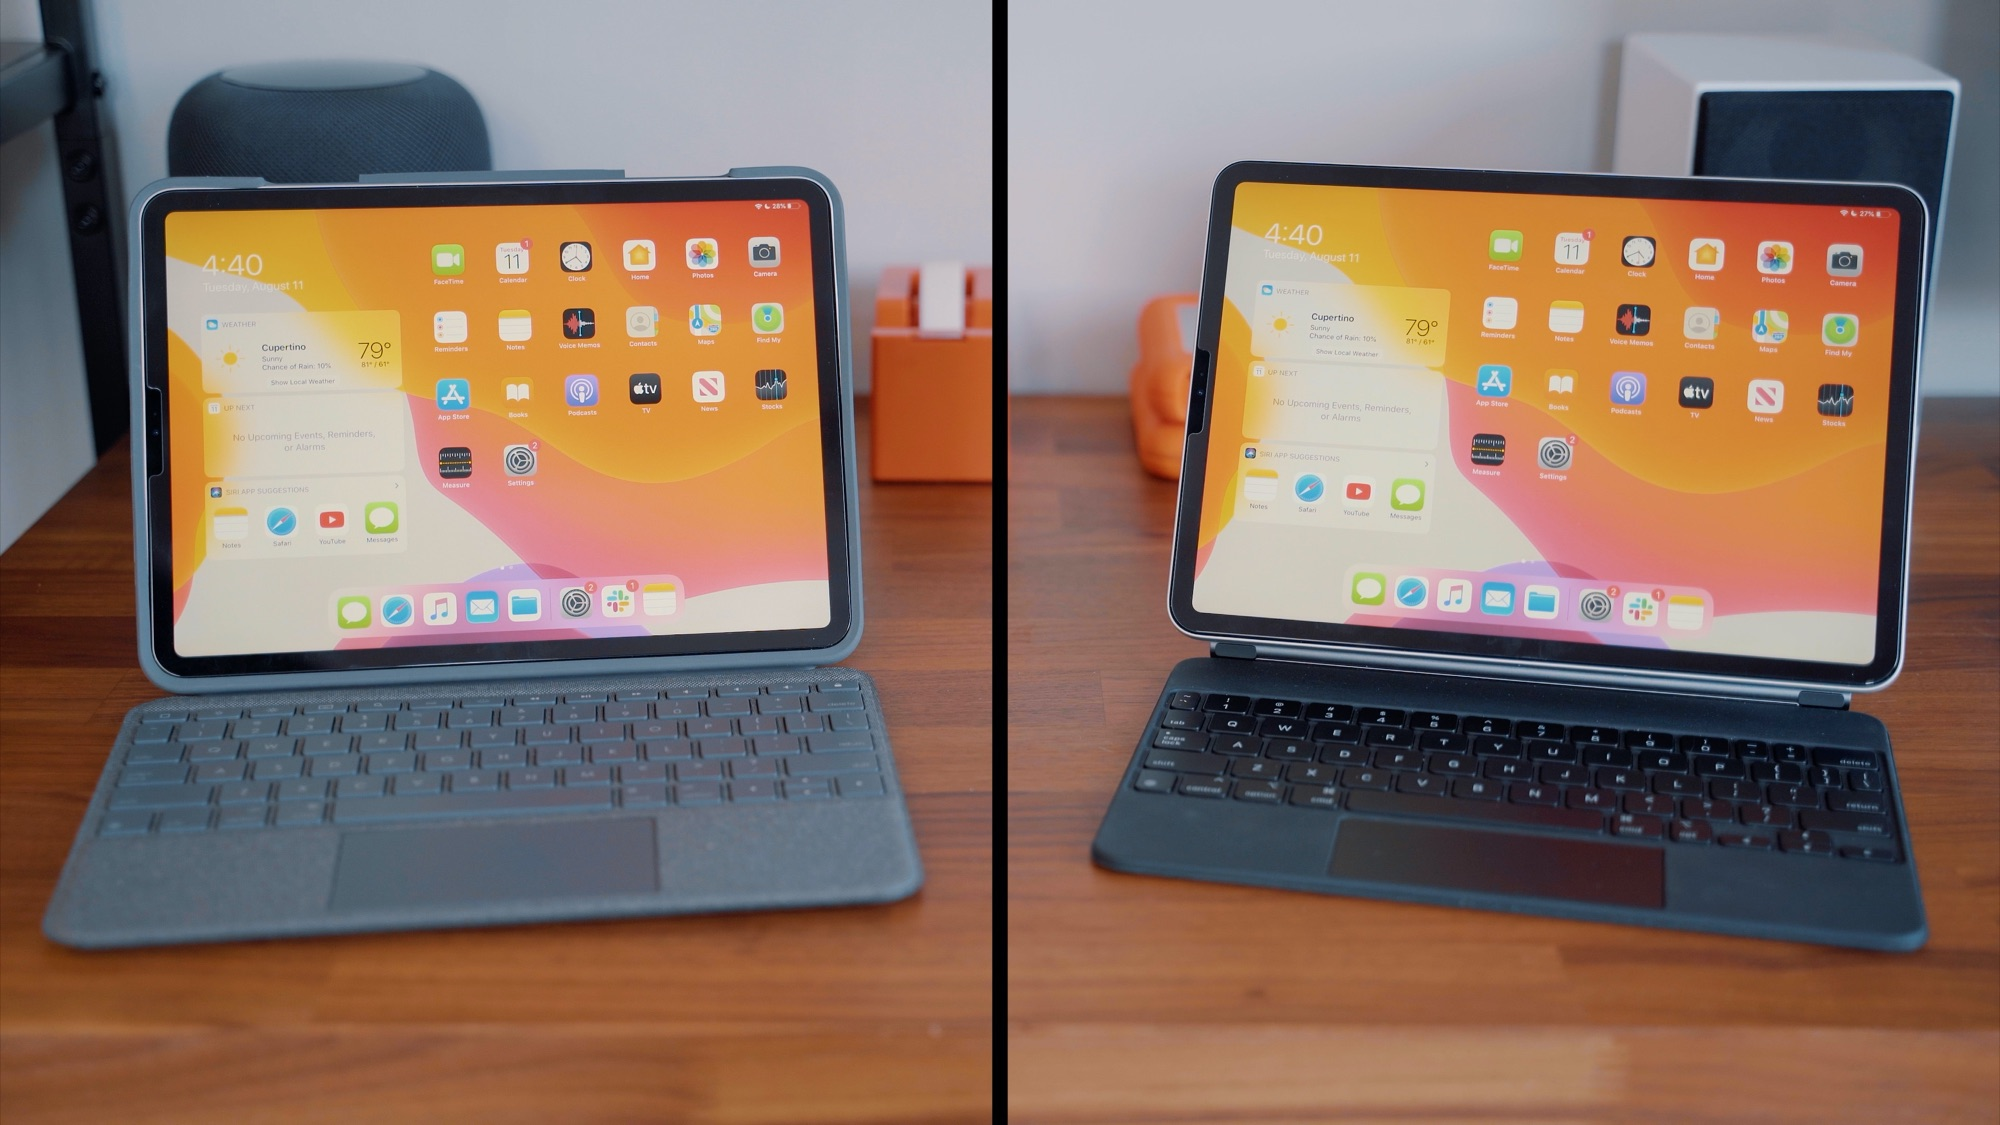 iPad Pro Keyboard Comparison: Logitech's $160 Folio Touch vs. Apple's $300 Magic Keyboard - MacRumors